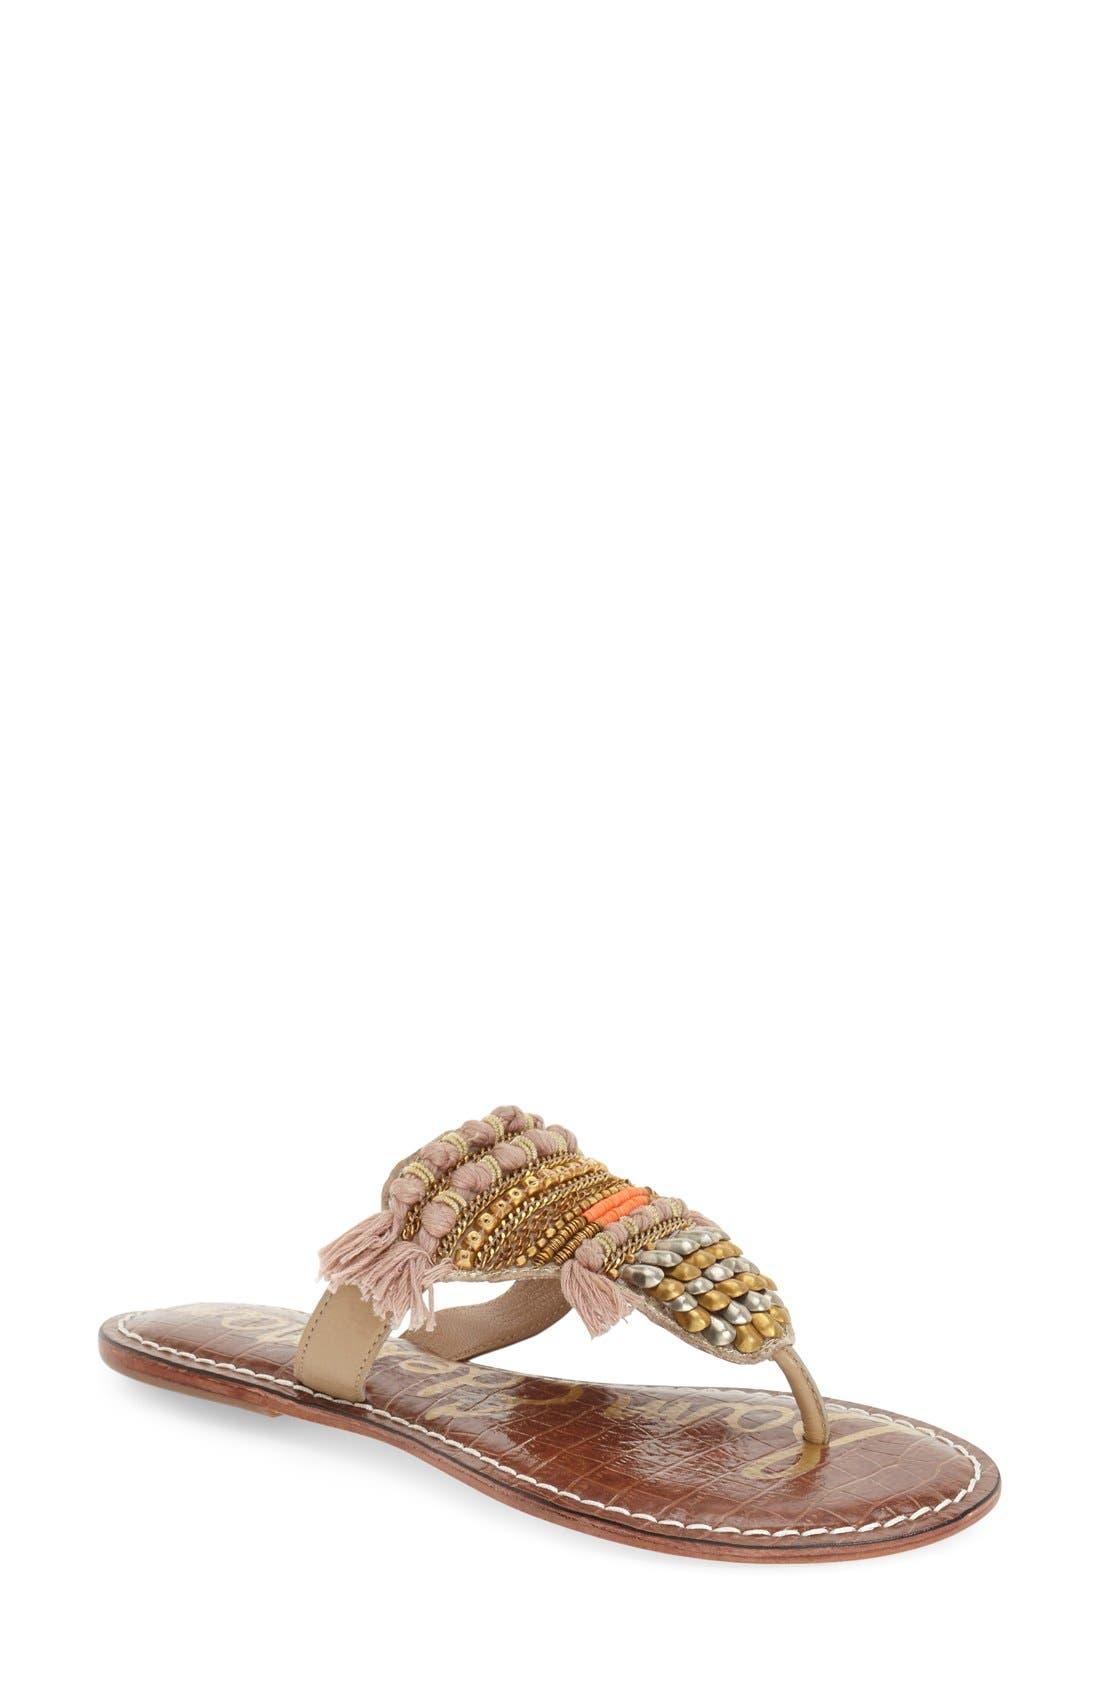 Main Image - Sam Edelman 'Kathy' Thong Sandal (Women)